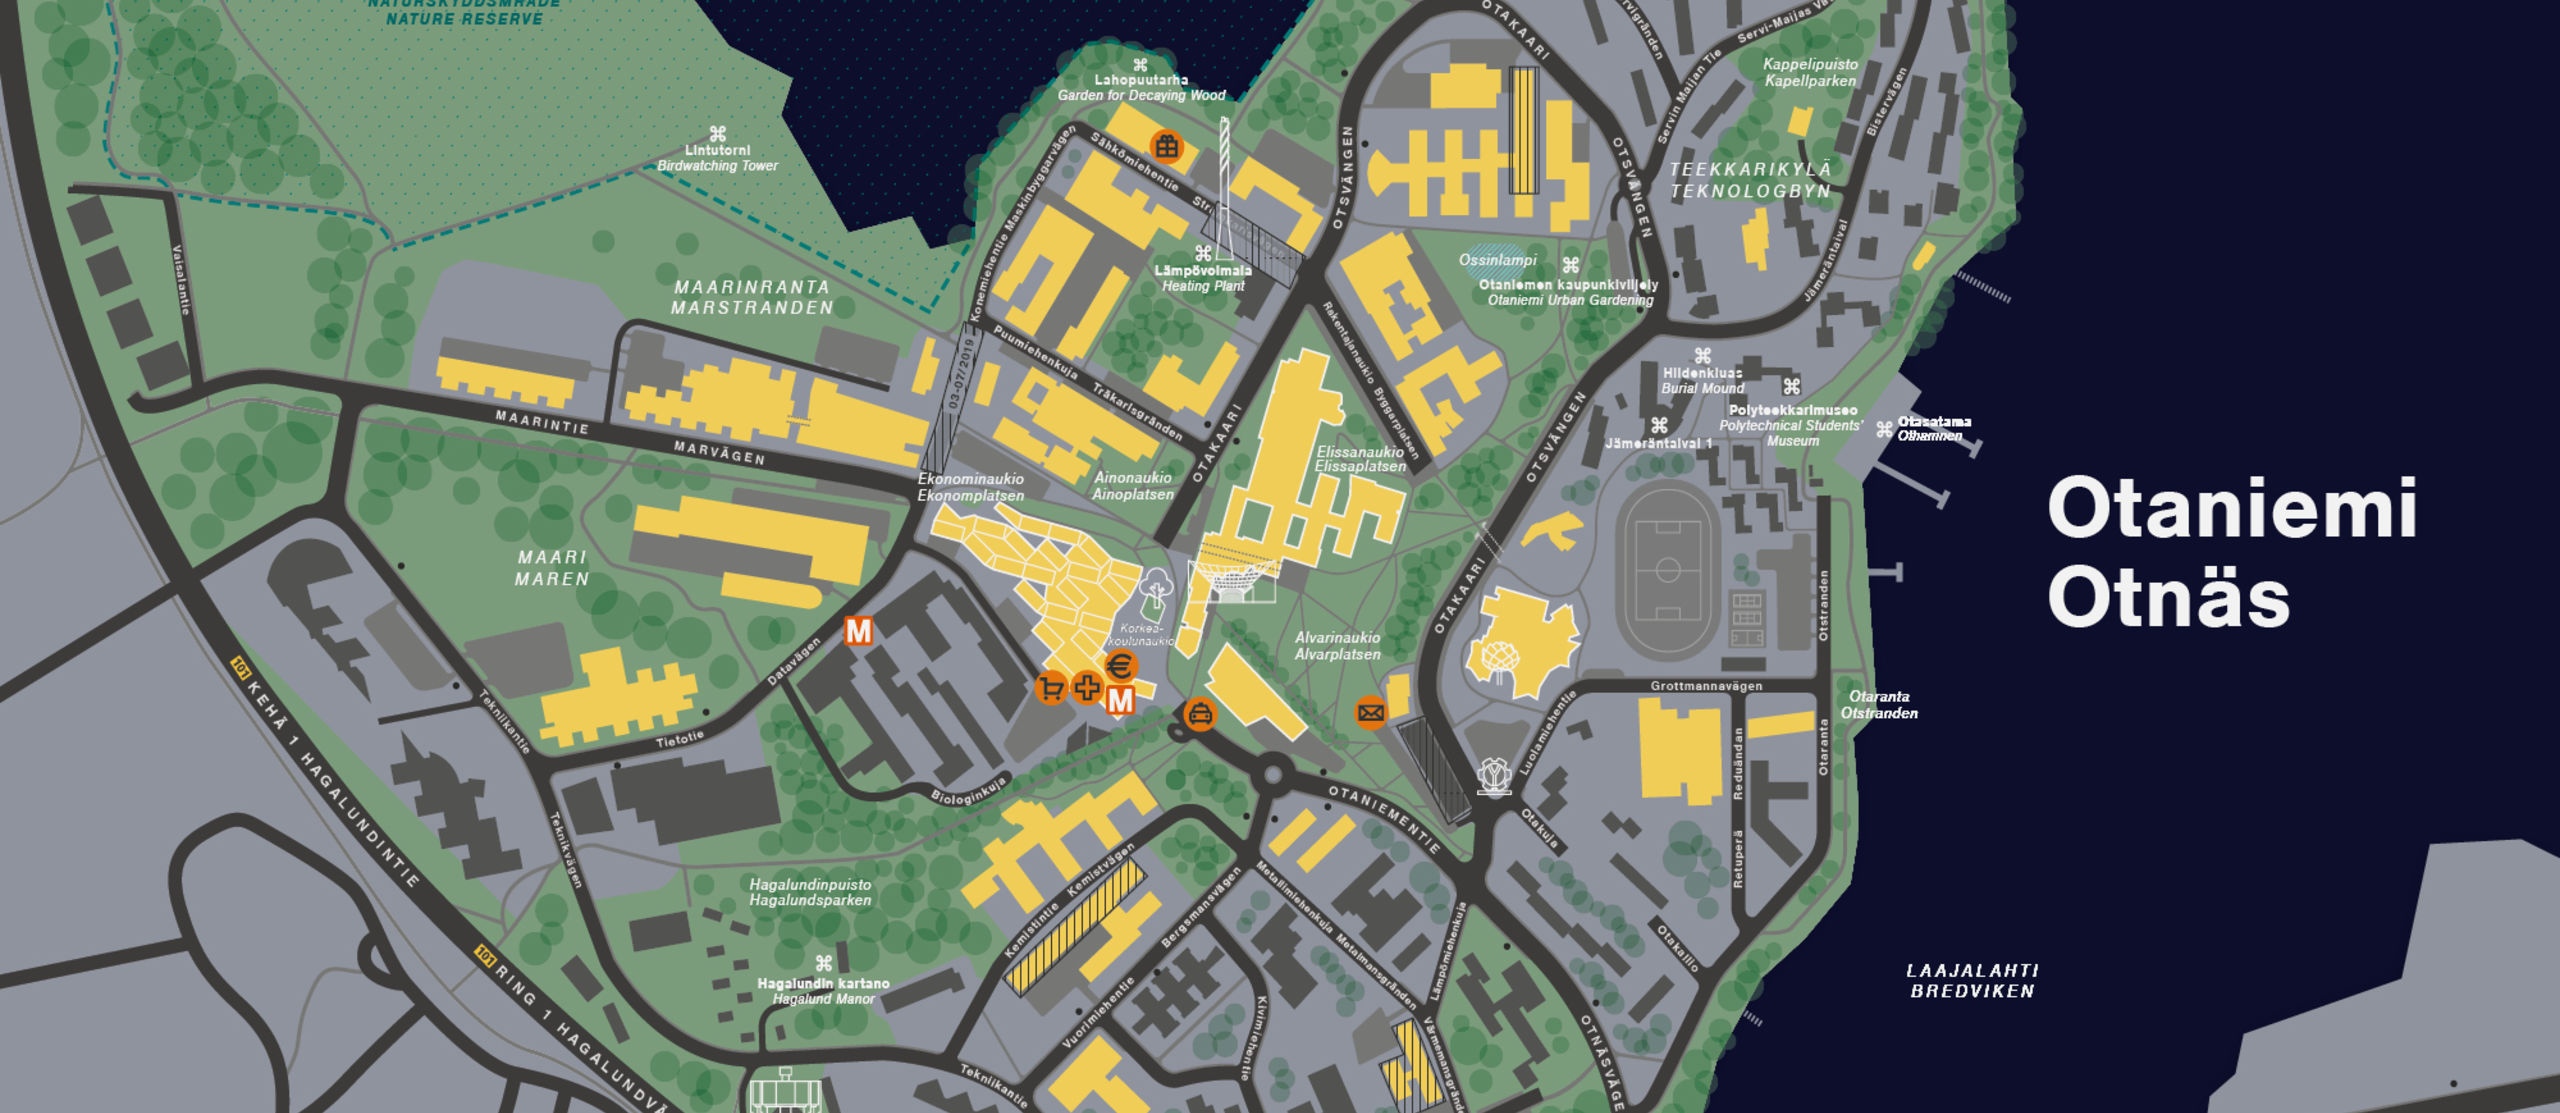 Salem College Campus Map.Campus Maps And Getting To Otaniemi Aalto University